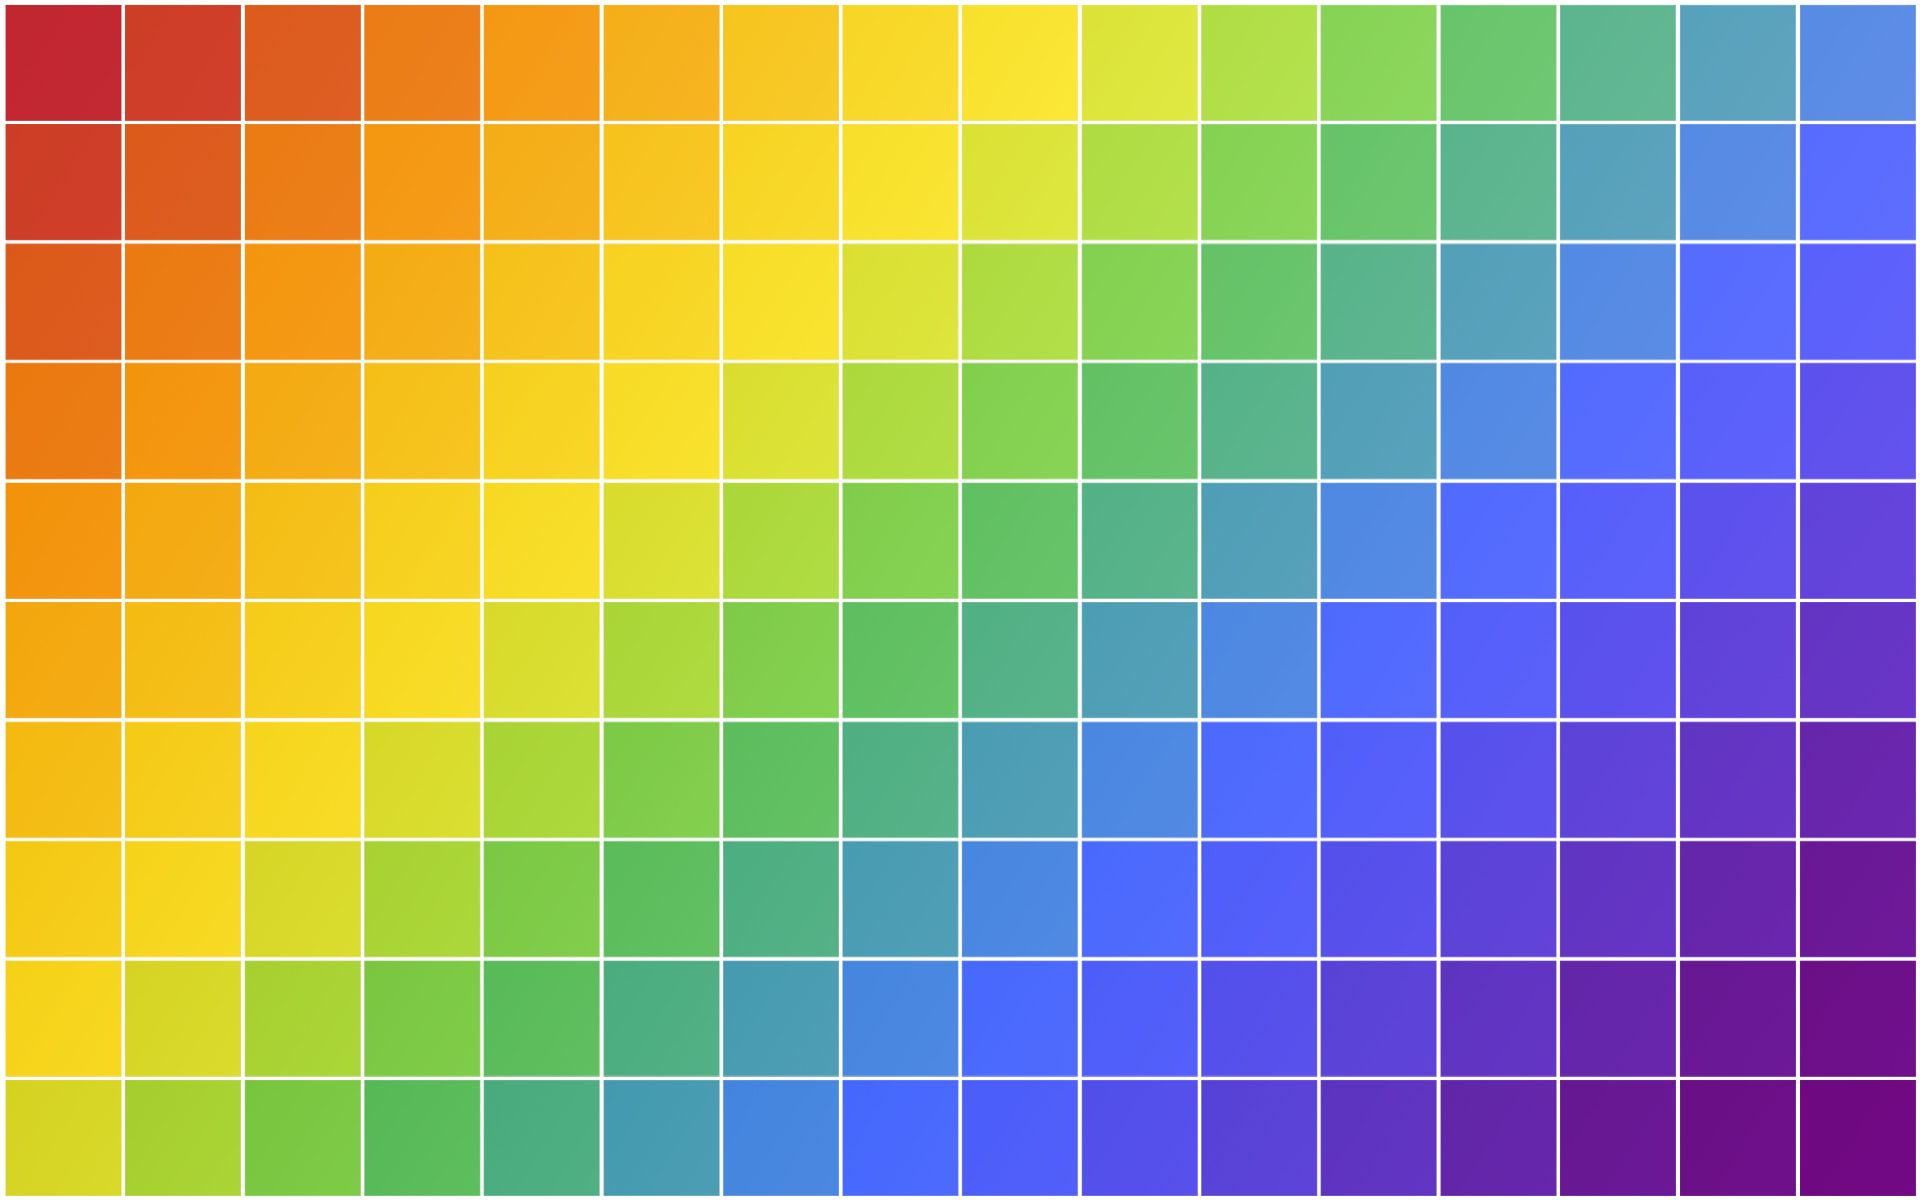 Rainbow Desktop Wallpaper Hd Rainbow Hd Pc Backgrounds With